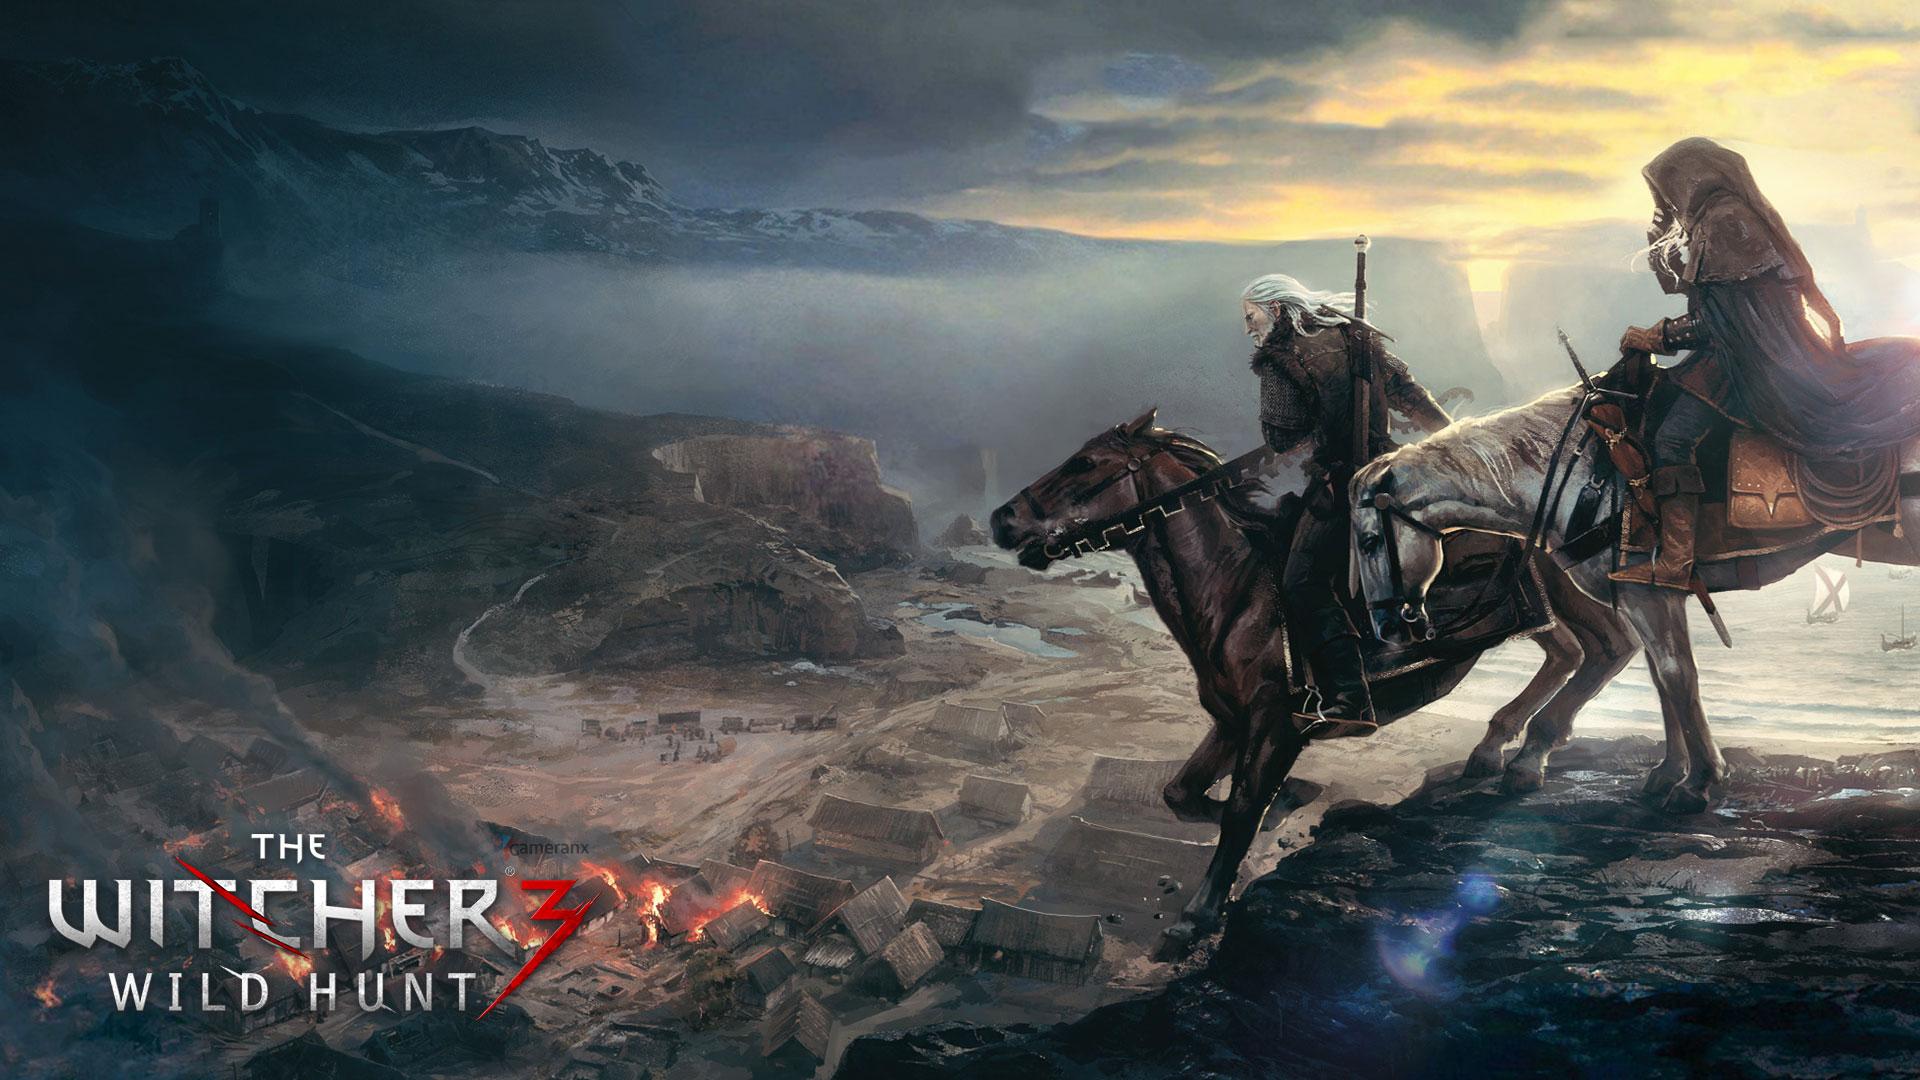 The Witcher 3 Wallpaper HD - WallpaperSafari